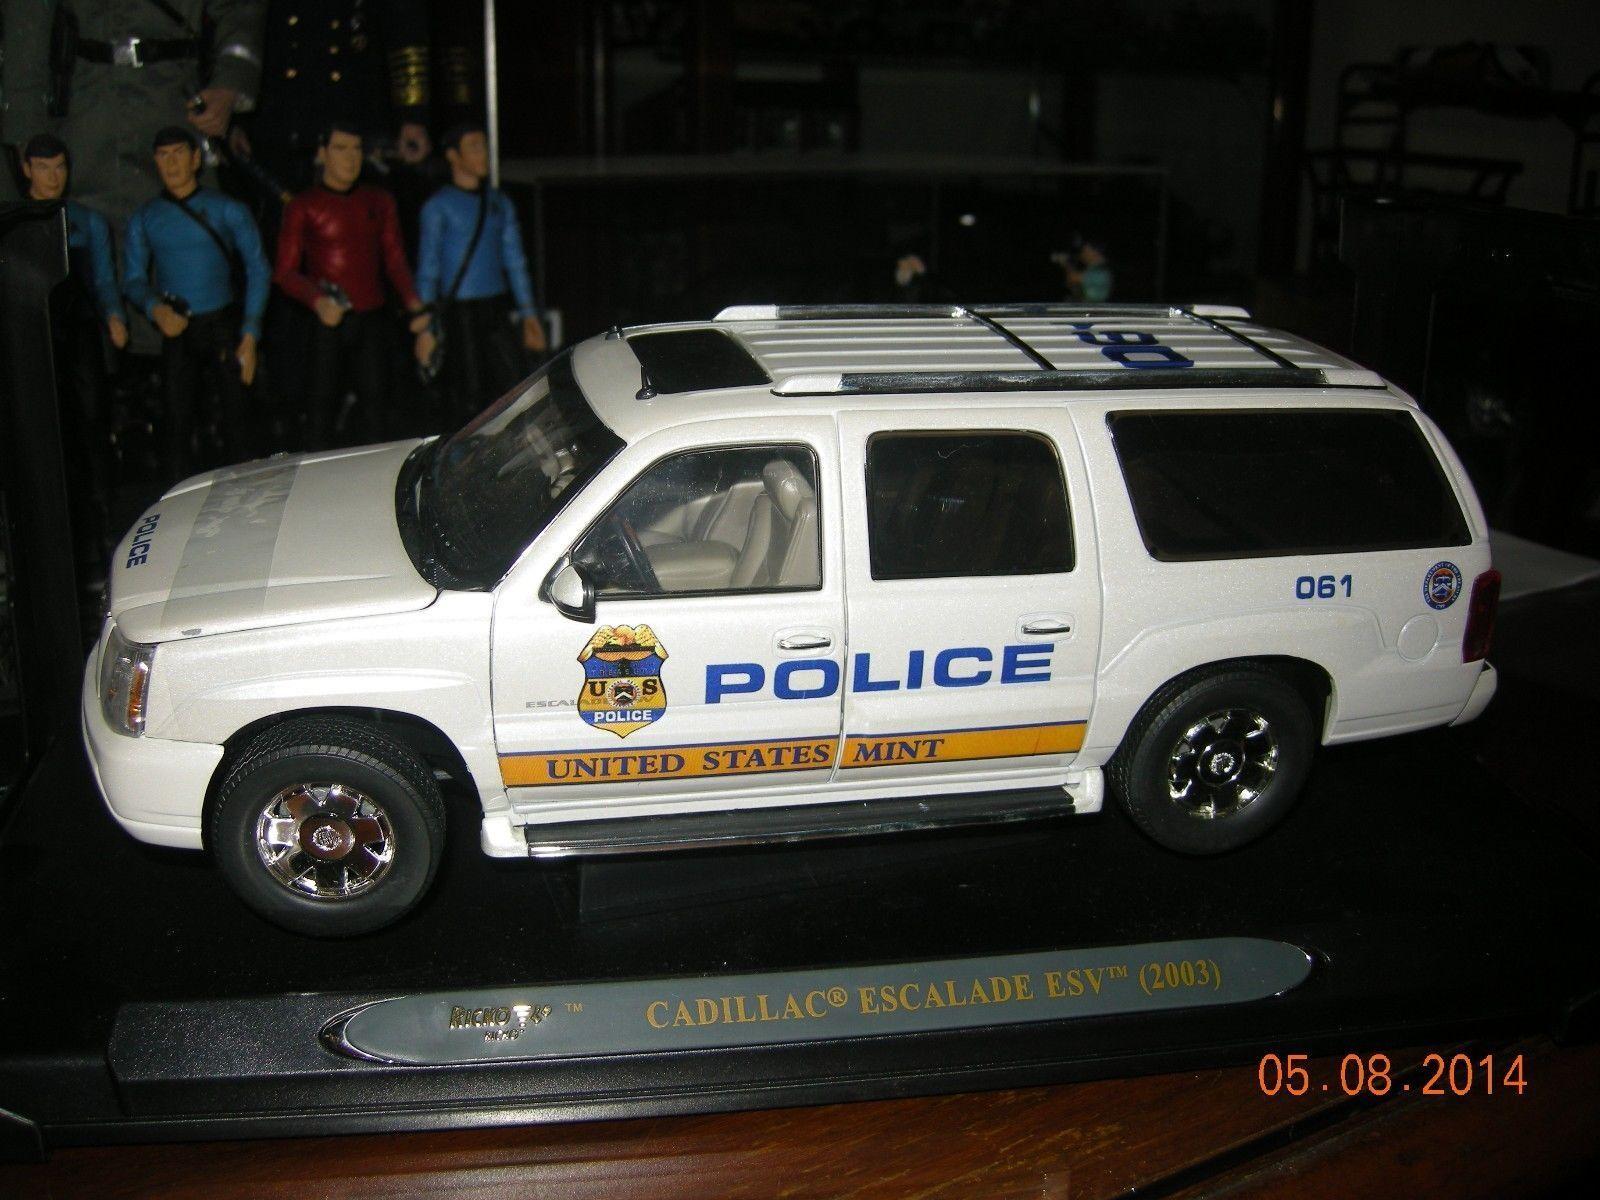 Cadillac ecalade 2003 Ricko policía Personalizado Con Cámara